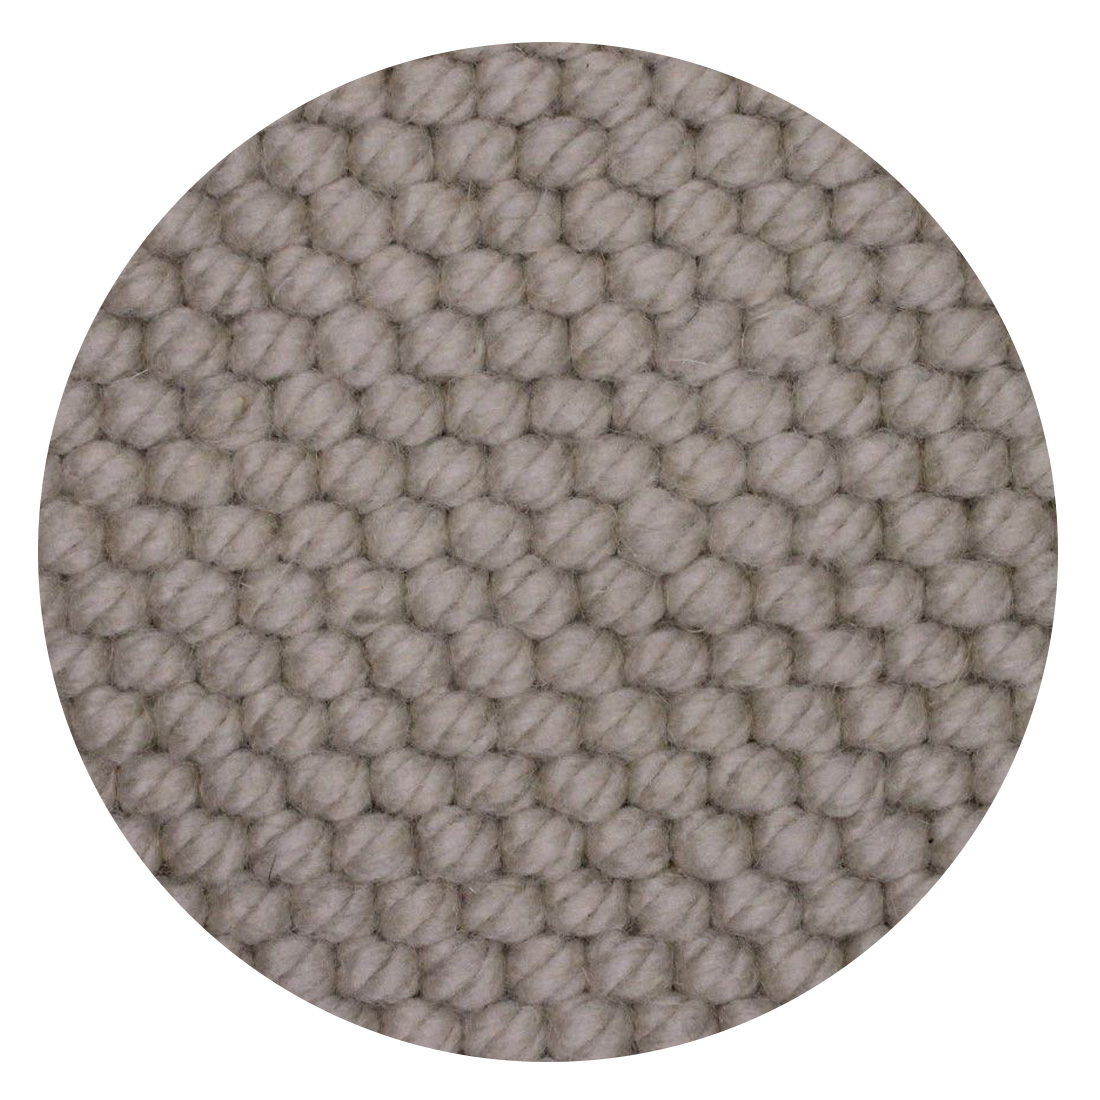 Rond Vloerkleed Nevada Beige 100 % New Zealand Wool